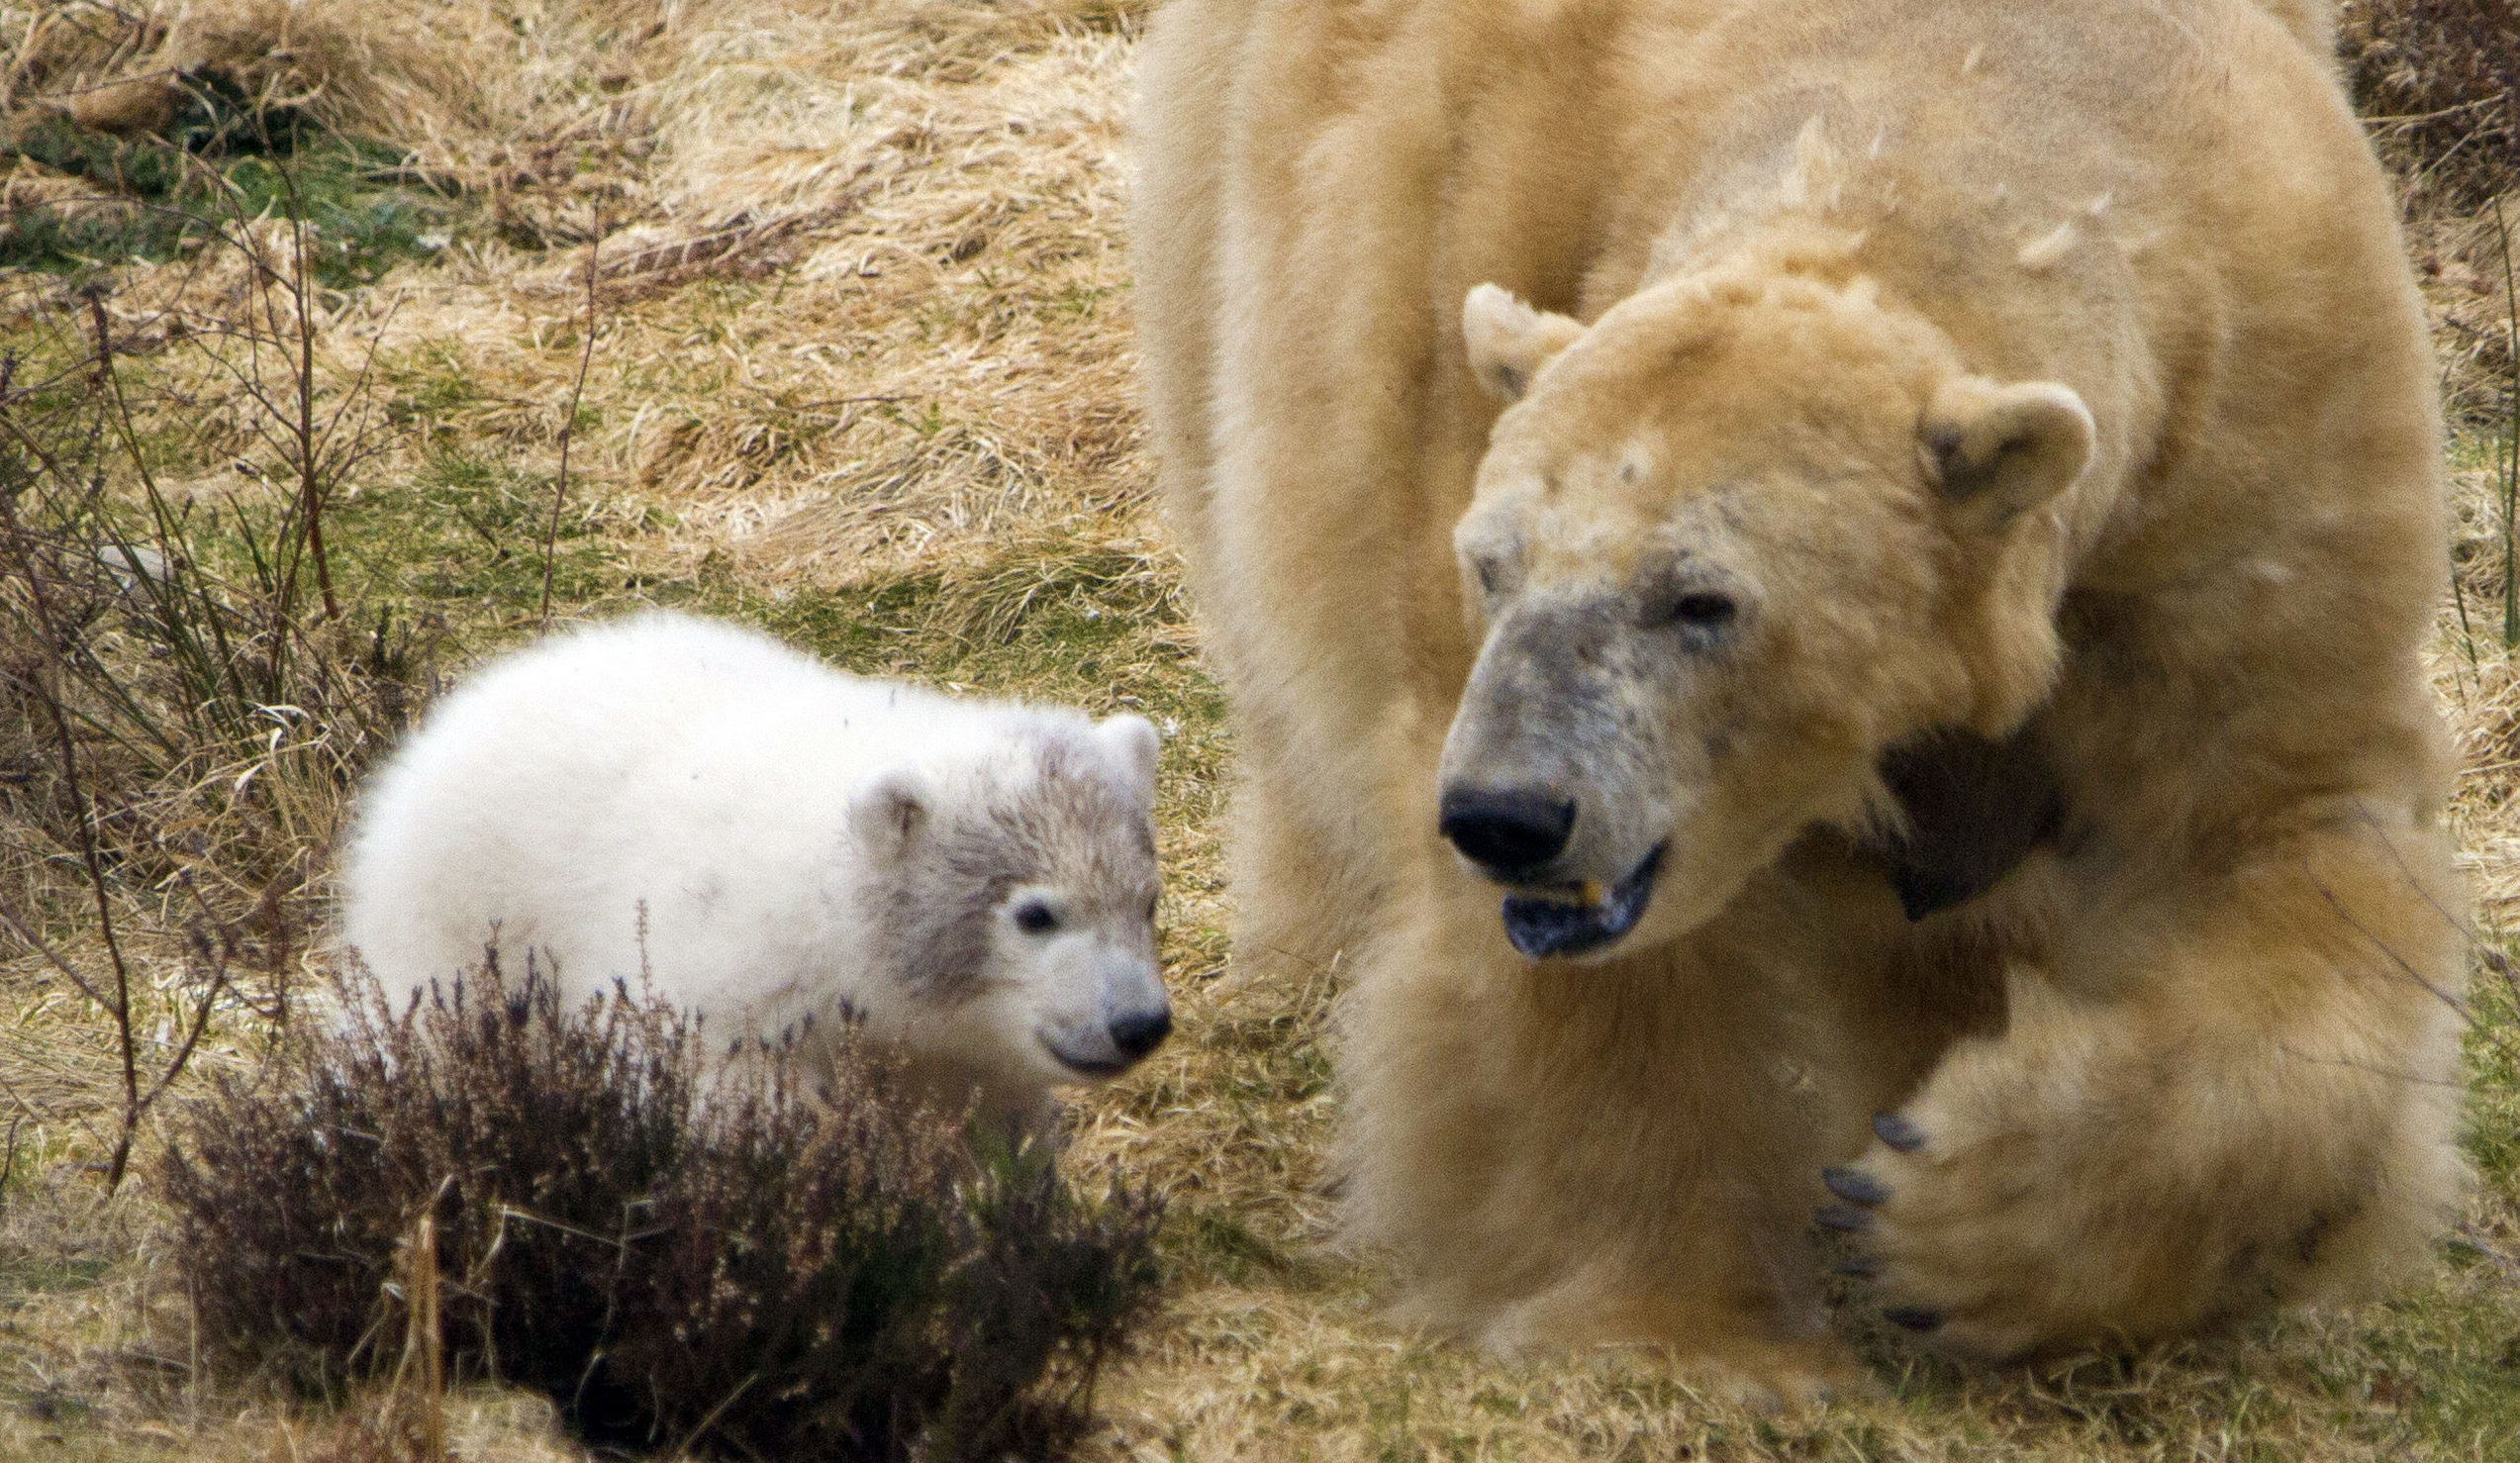 Polar bear Victoria and her cub Hamish (Jon Paul Orsi/RZSS/PA Wire)